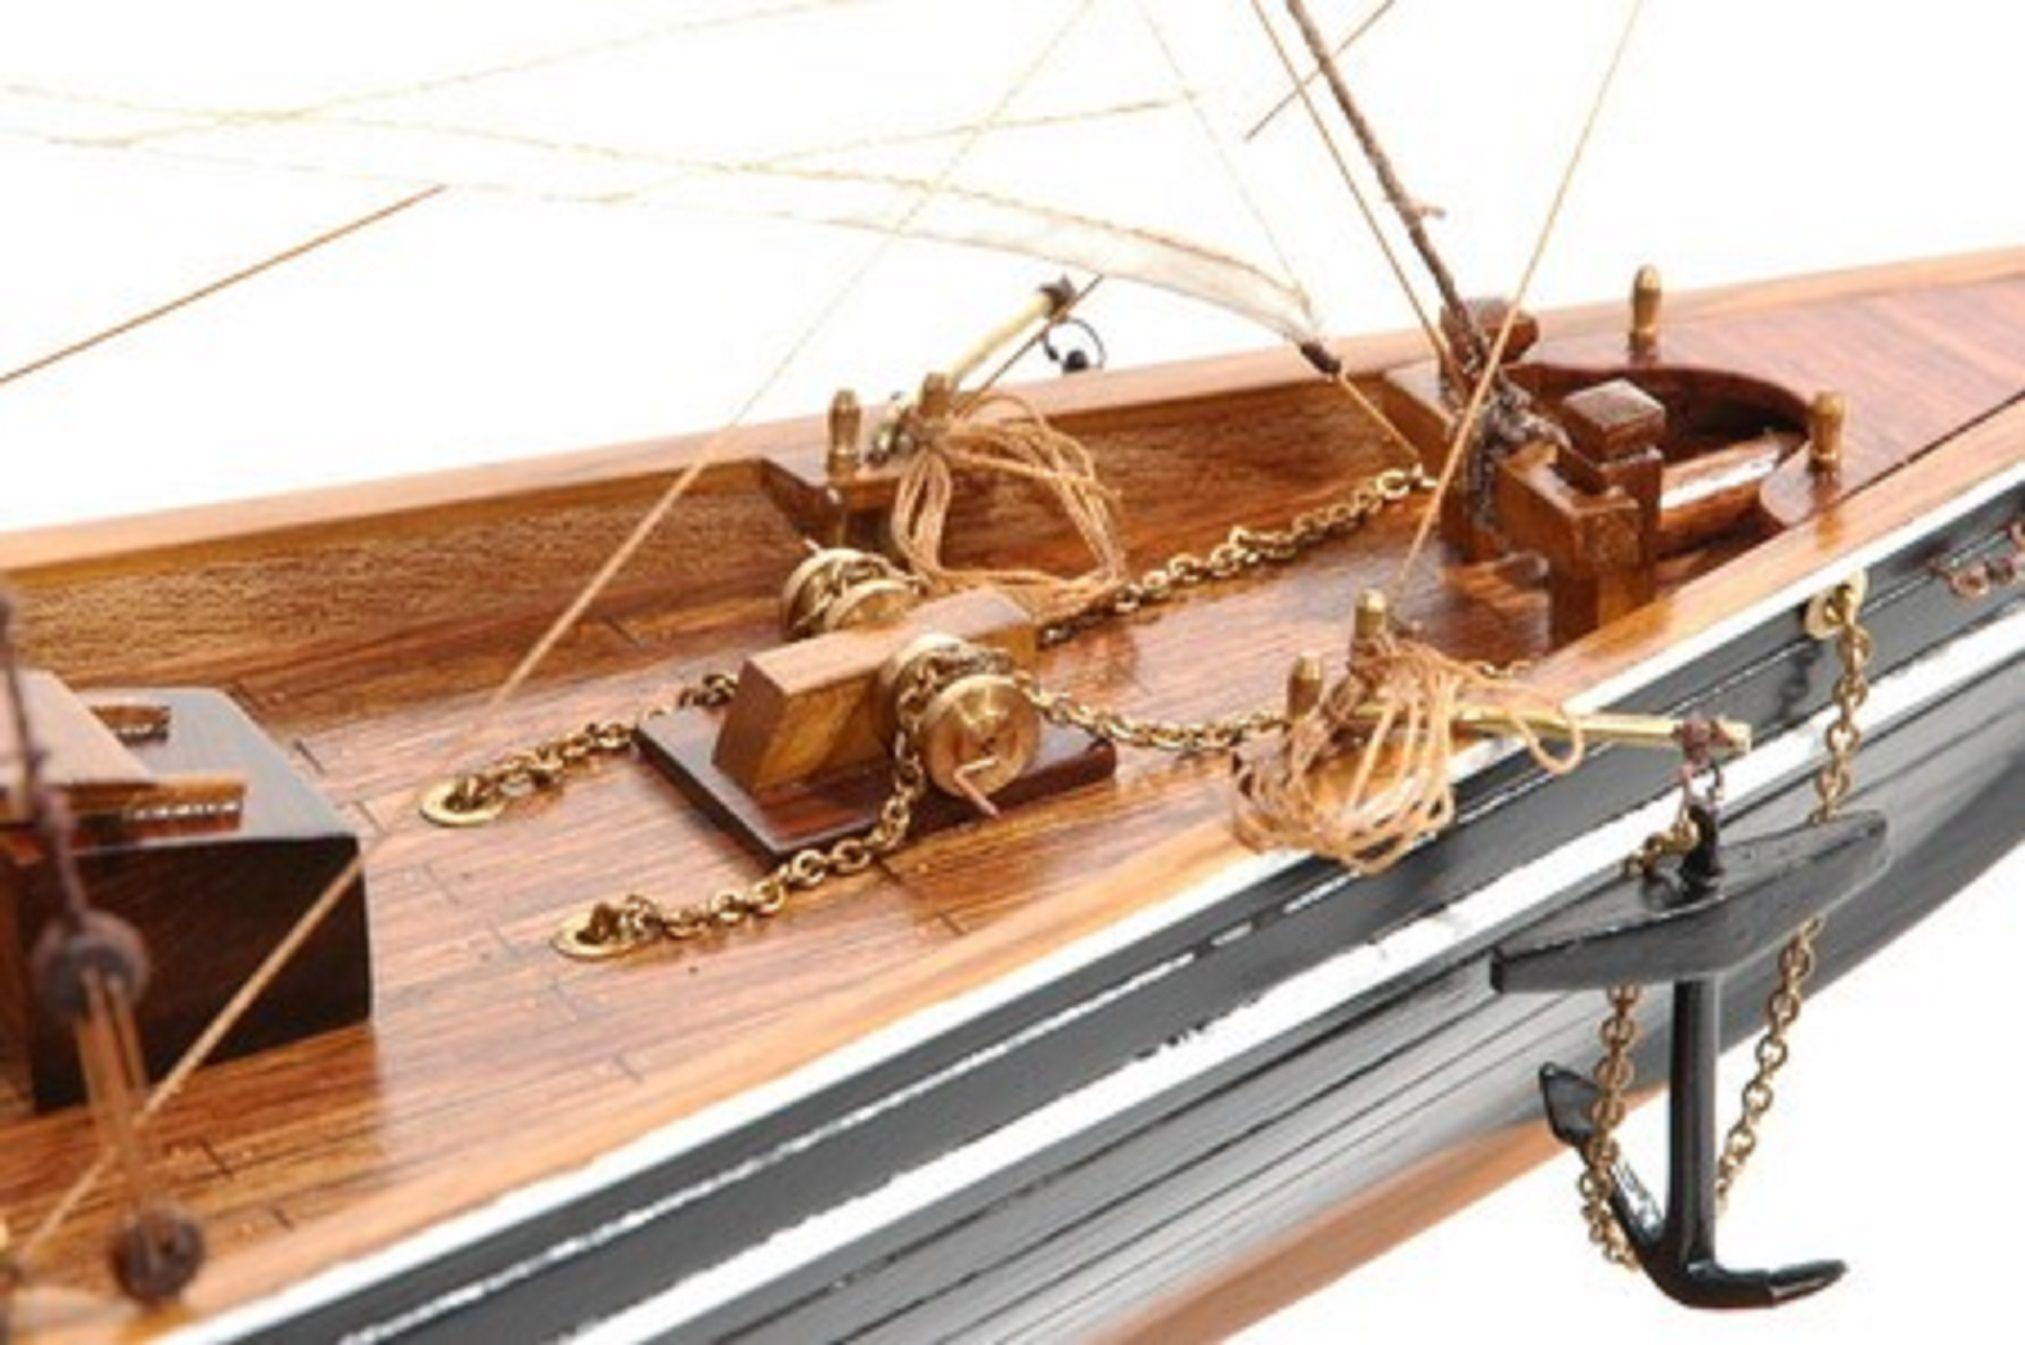 471-6969-Blue-Nose-II-Model-Yacht-Premier-Range